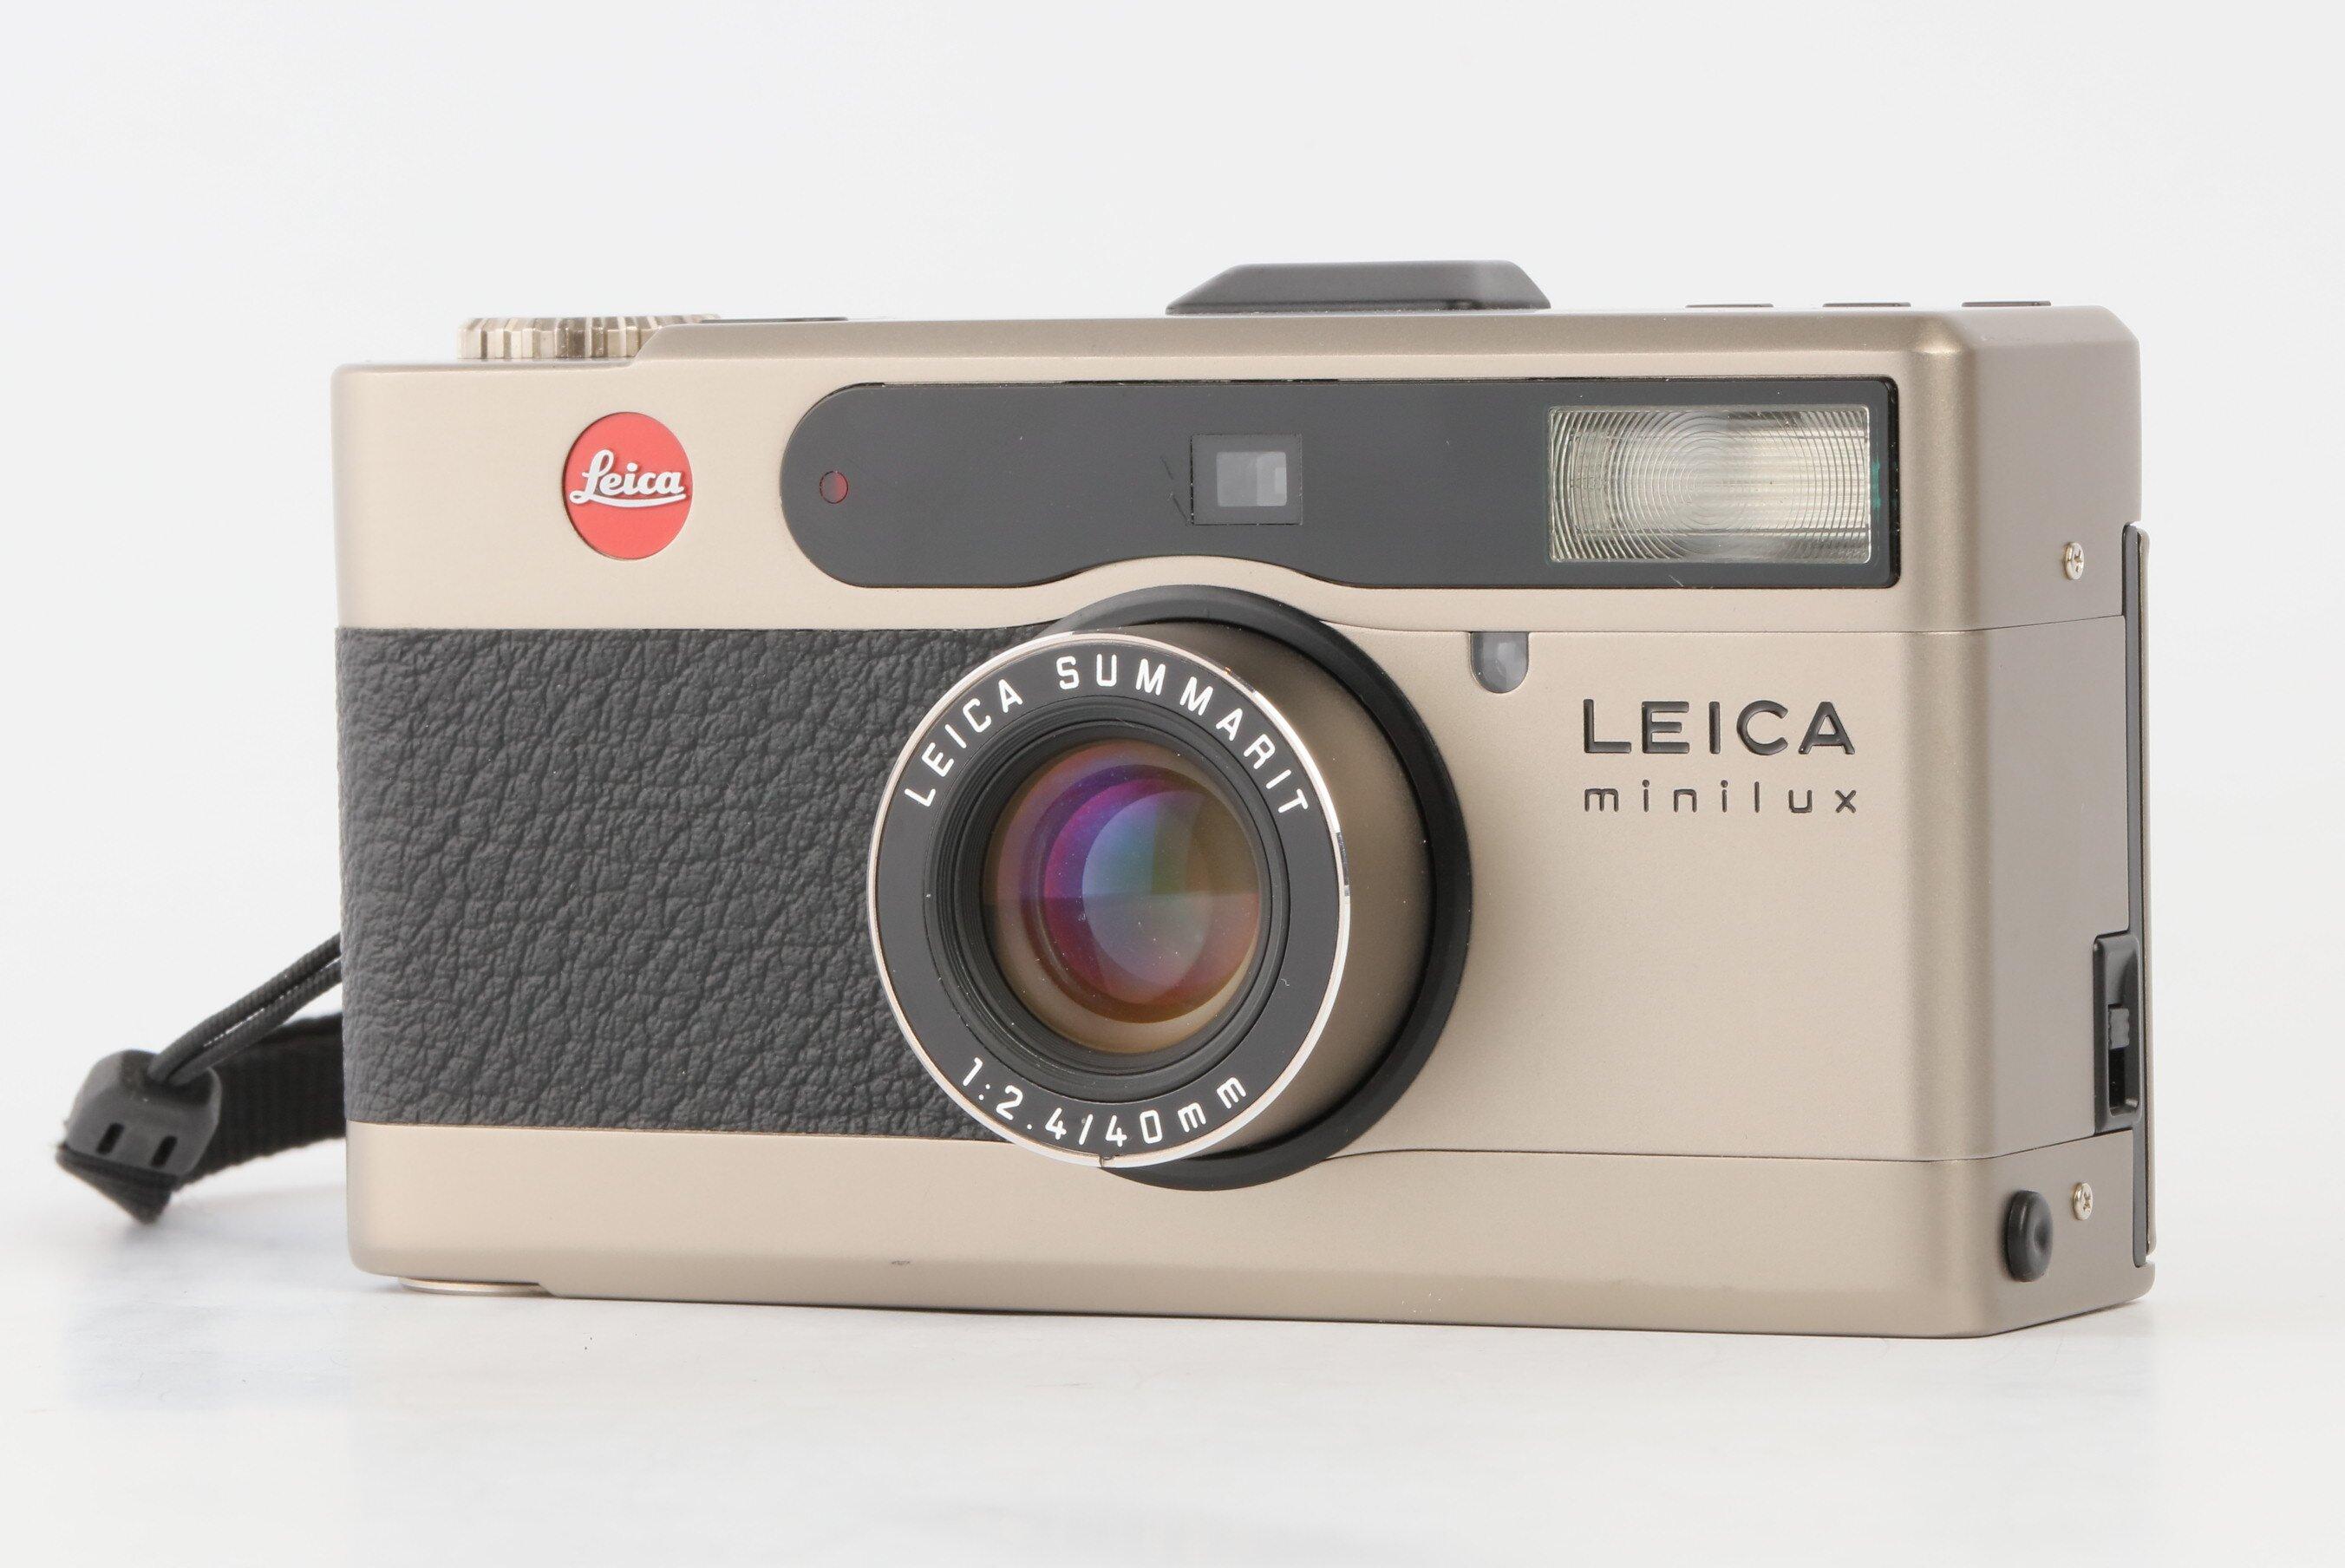 Leica minilux Summarit 2,4/40mm Titan